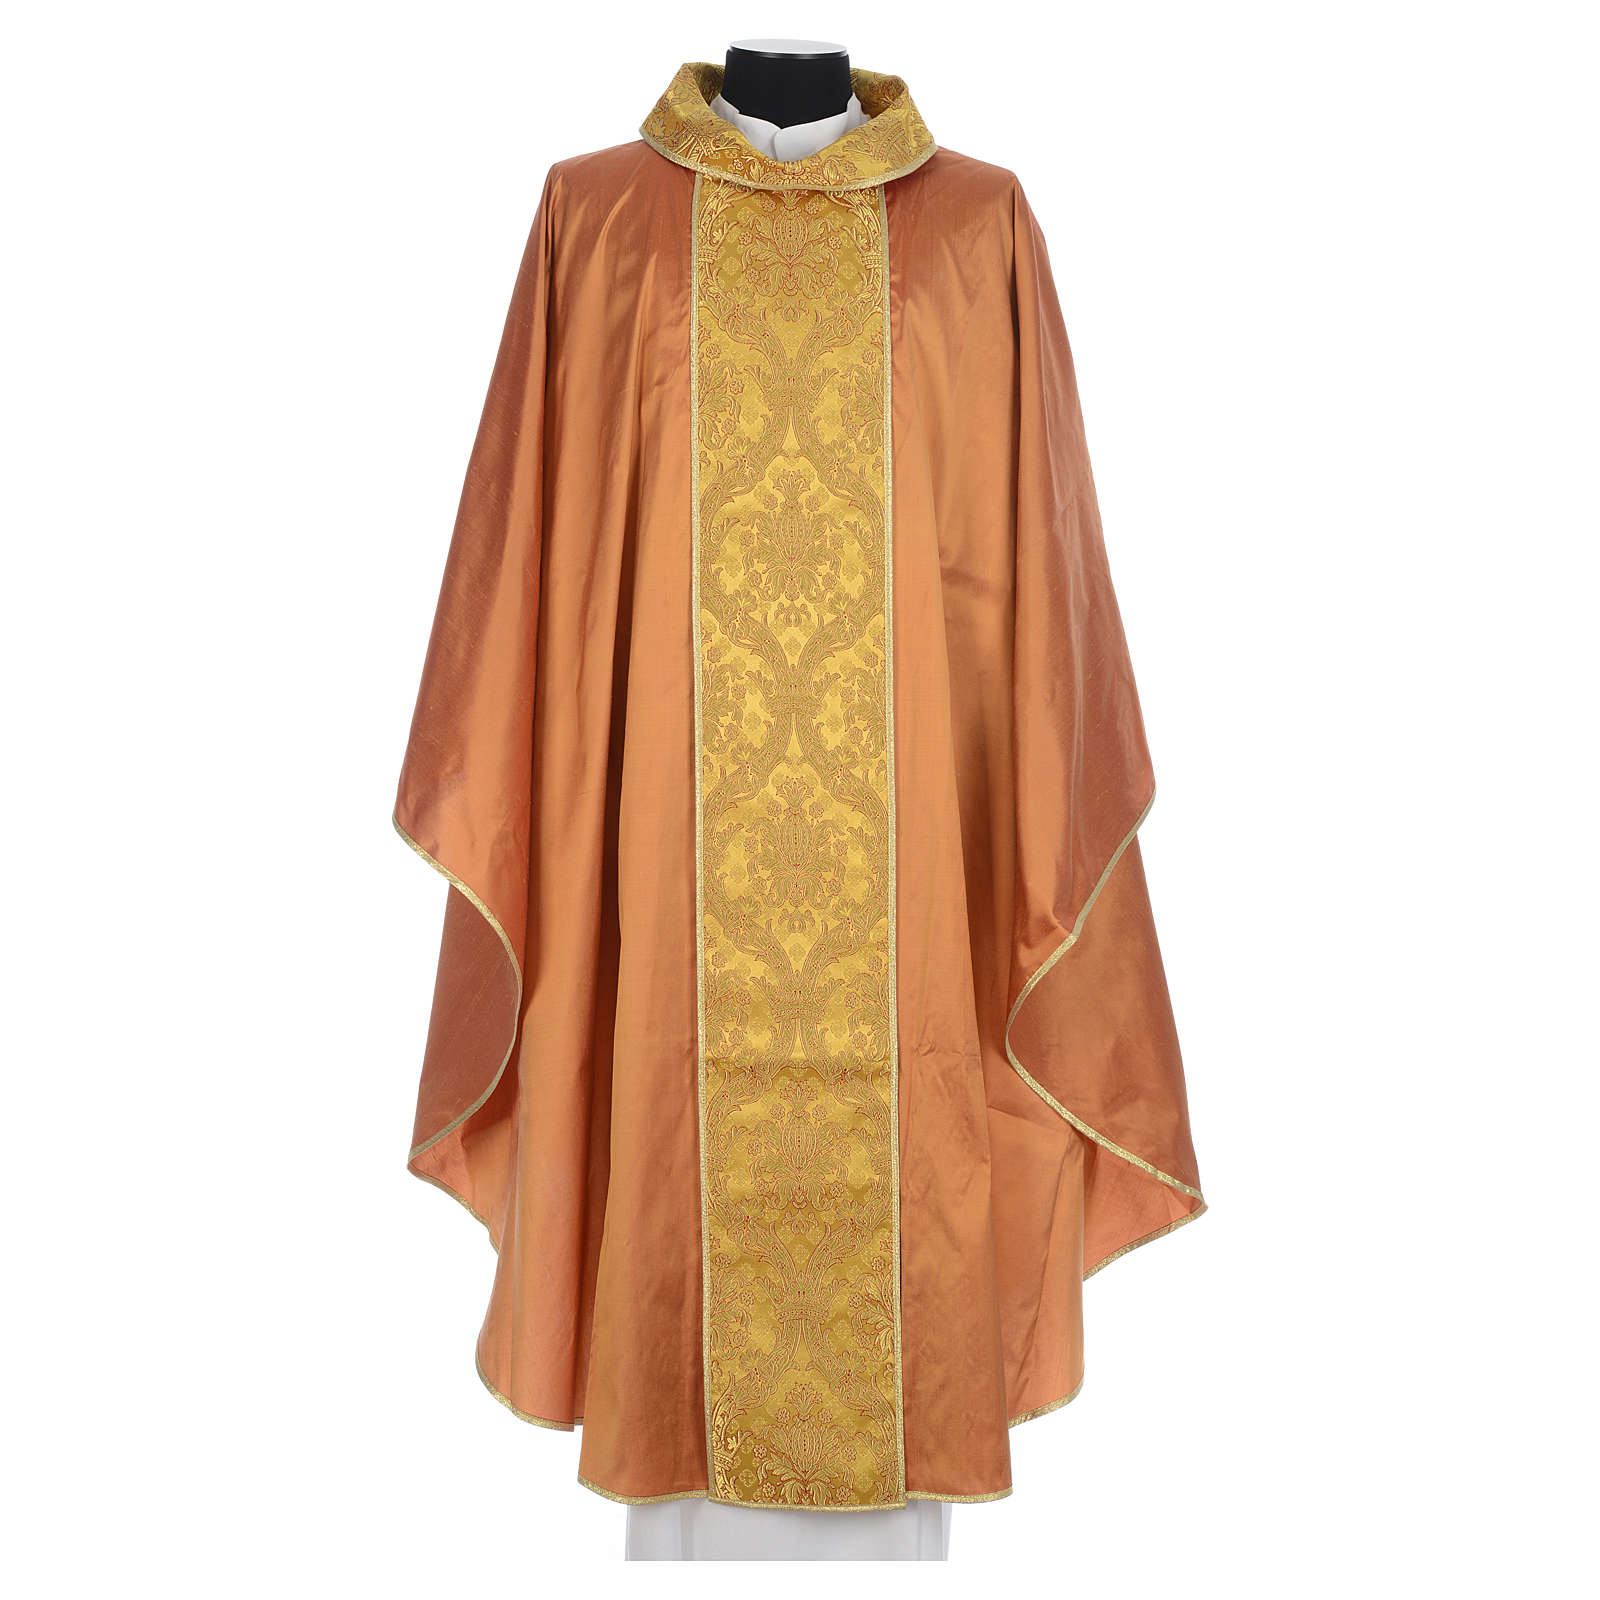 Gold Latin  Chasuble 100% silk brocade orphrey 4